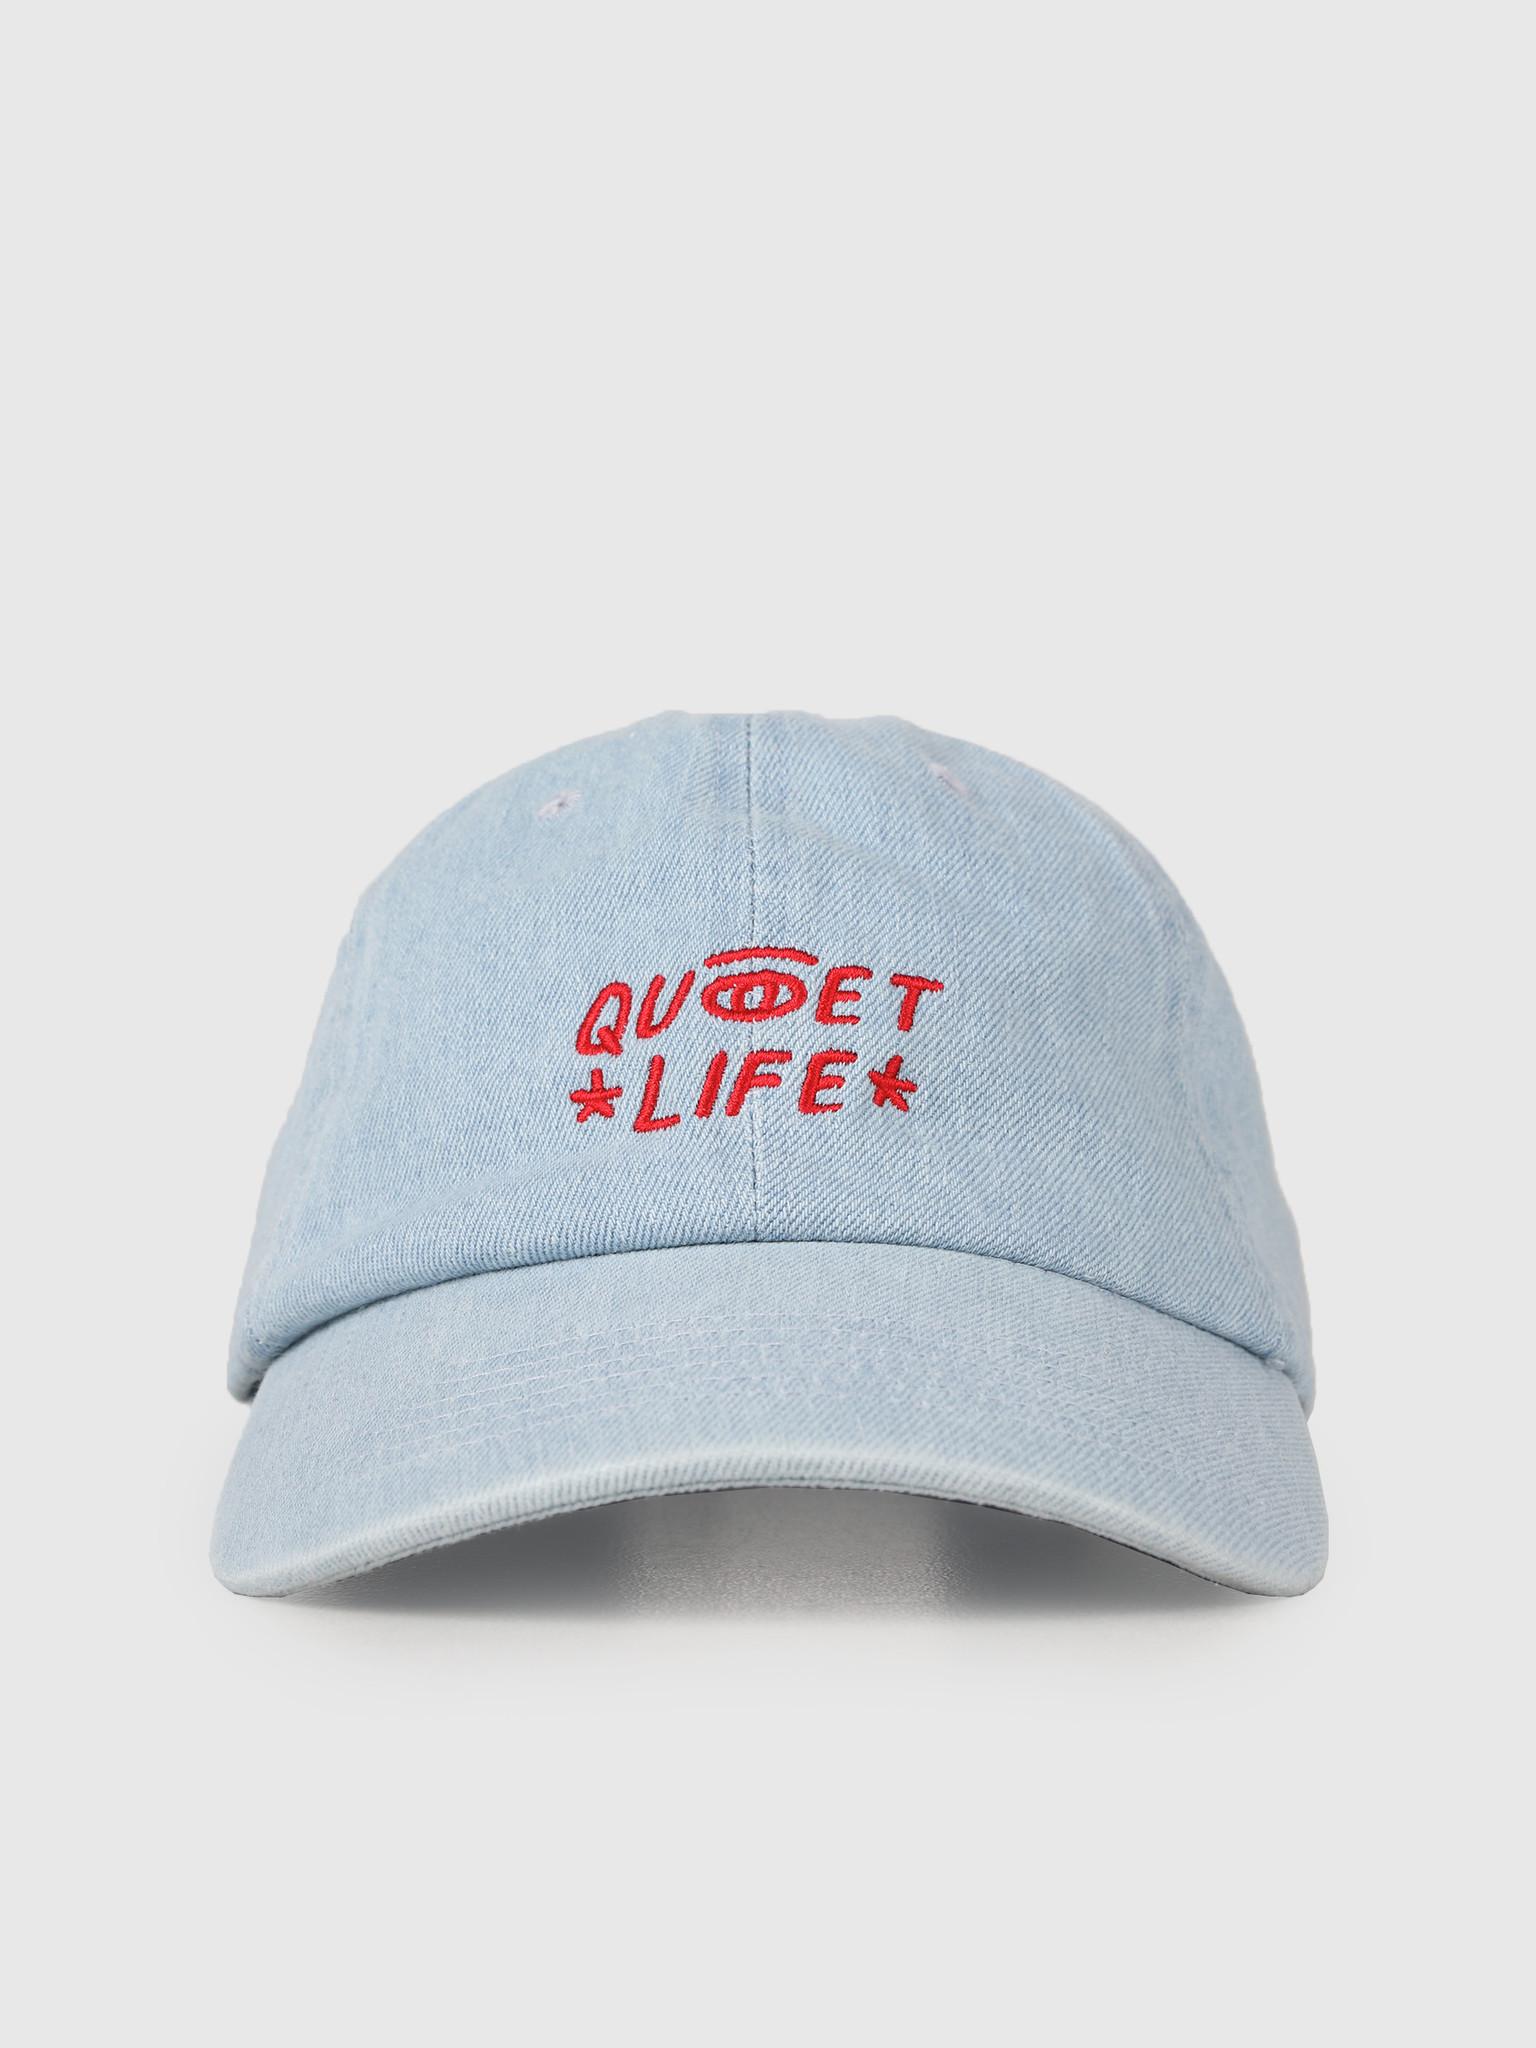 The Quiet Life The Quiet Life Quiet Eye Dad Hat Denim 19SPD1-1237-DEN-OS